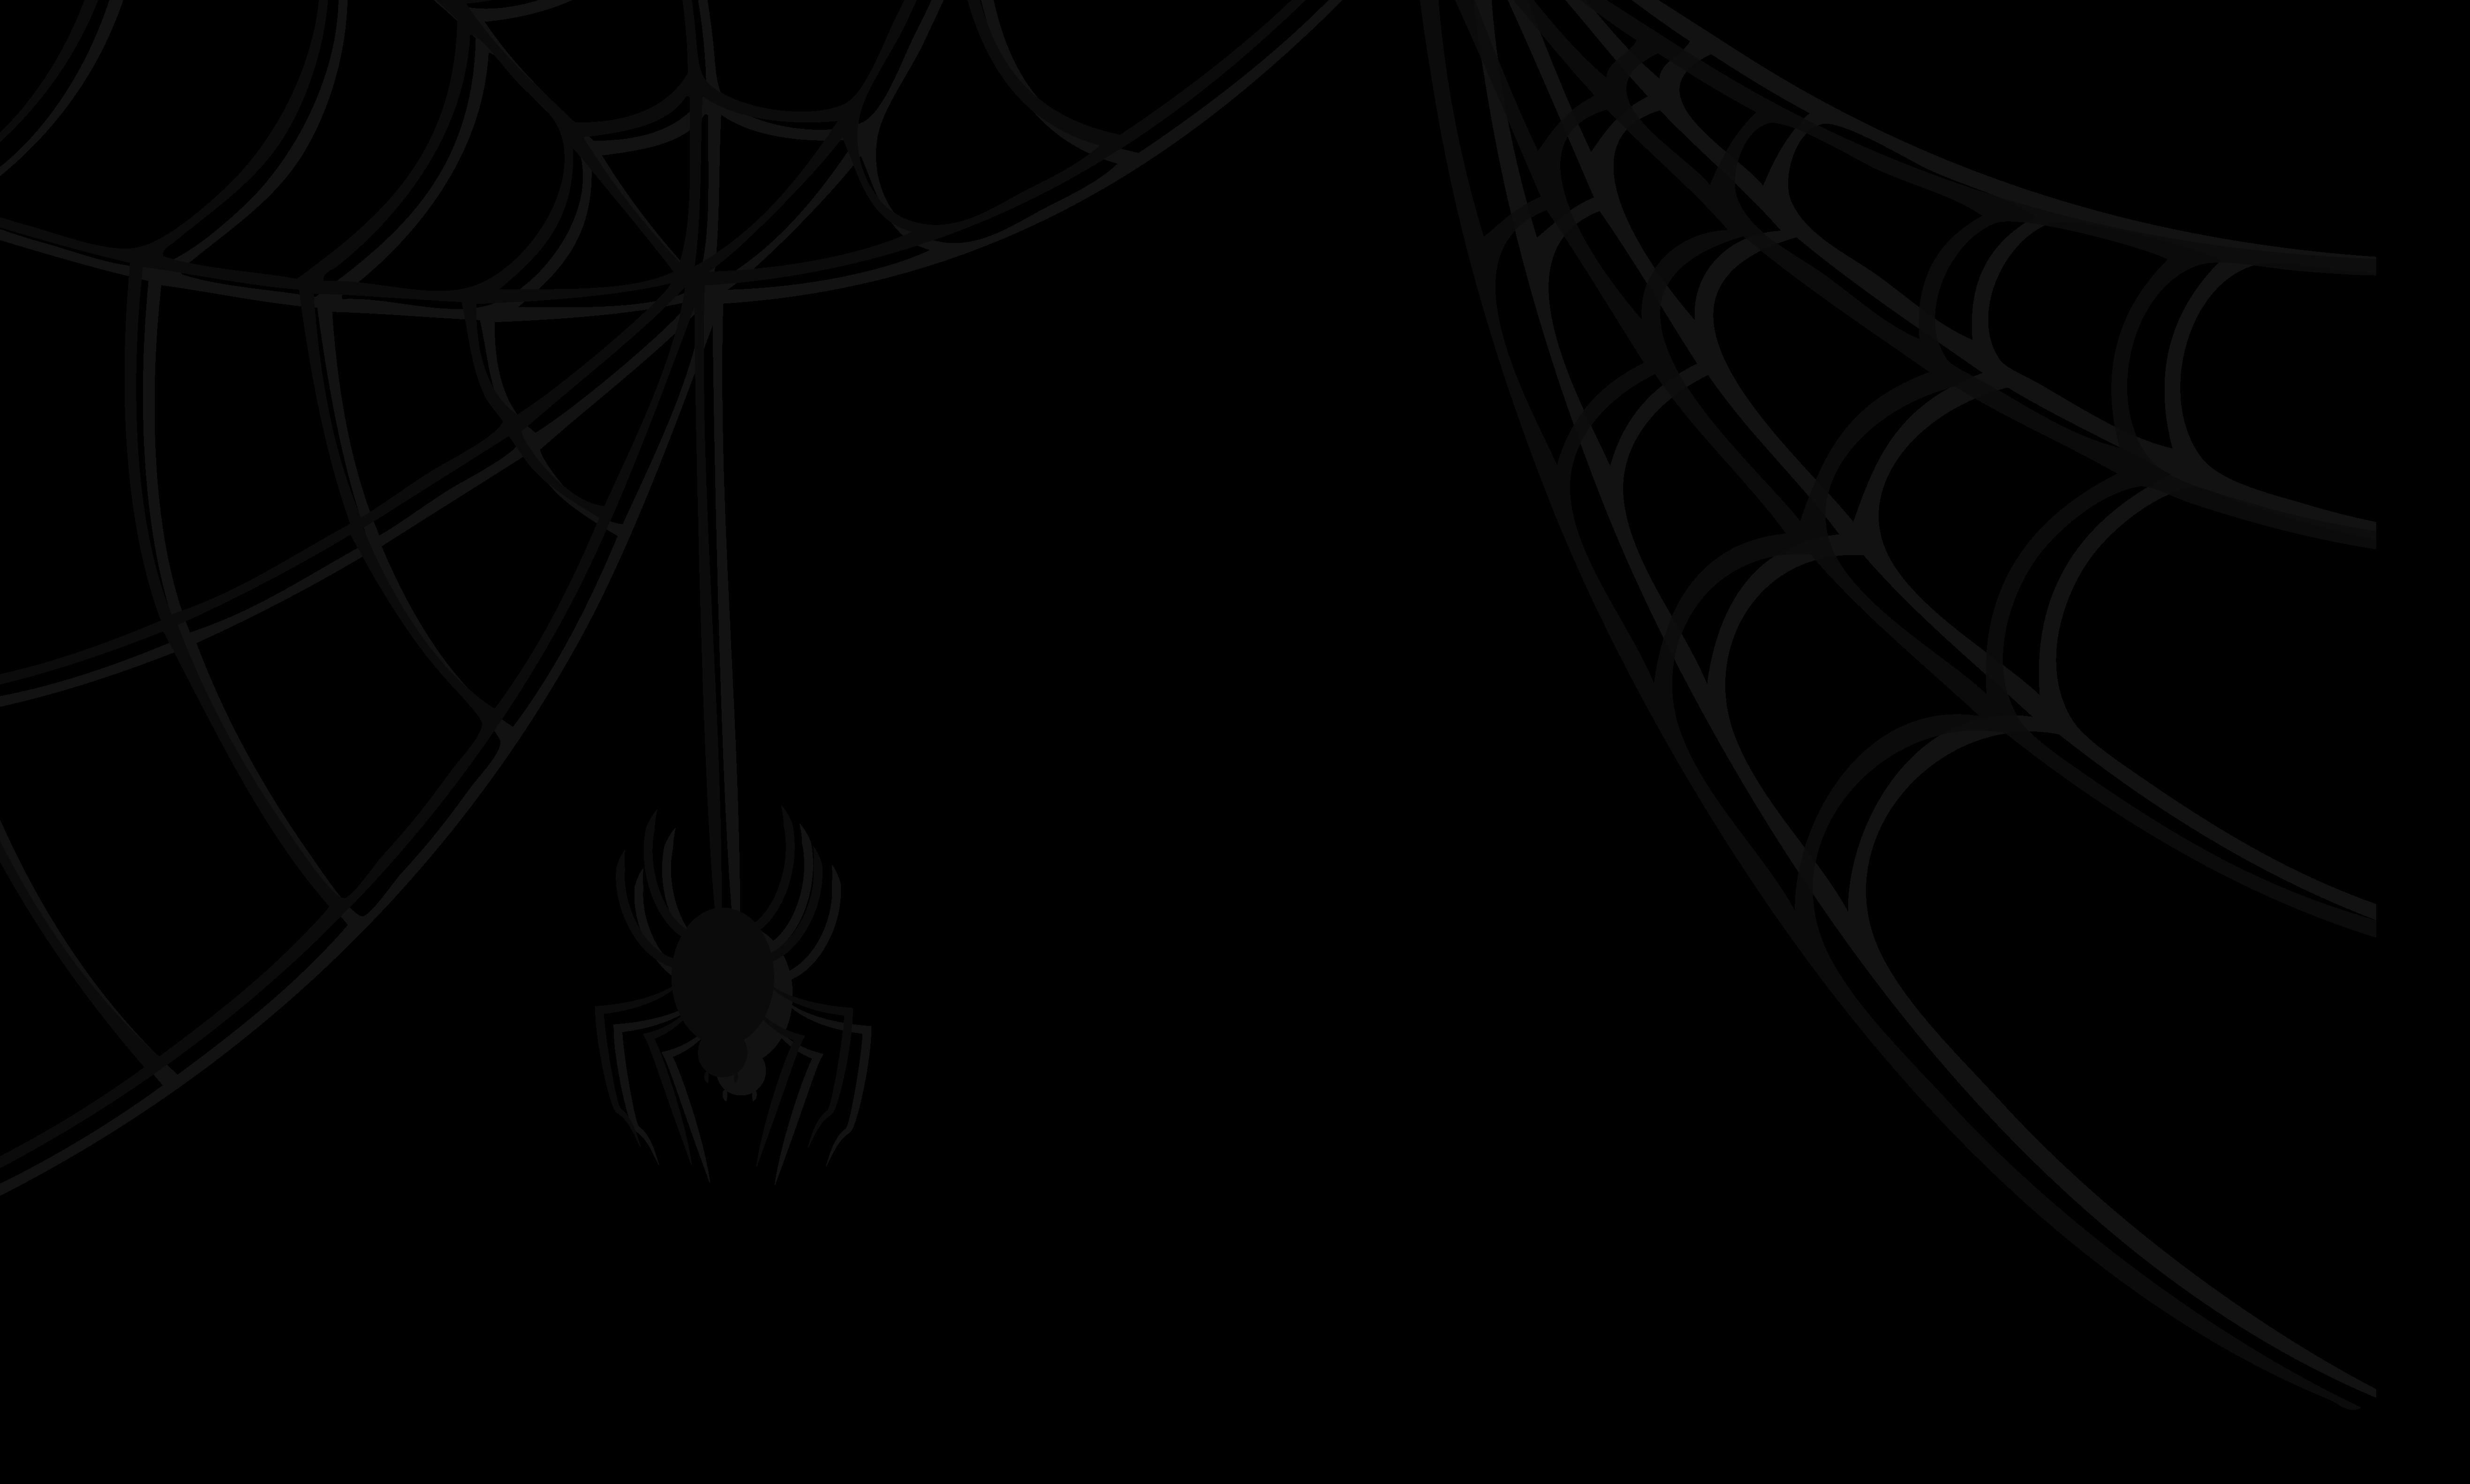 Cute spider web clipartblack. Hill clipart roller coaster